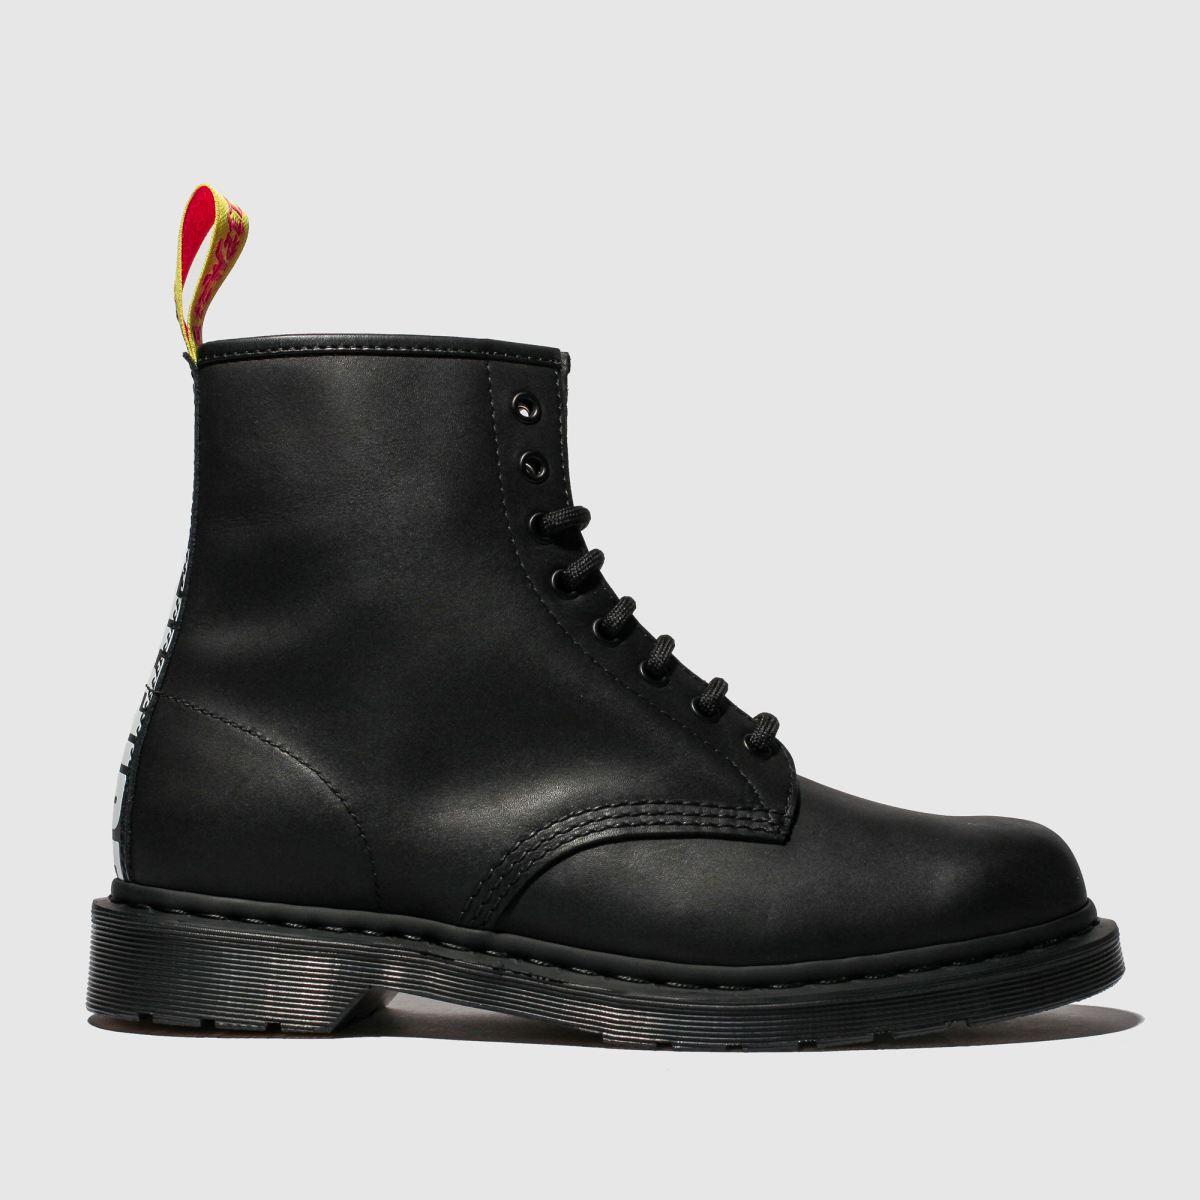 Dr Martens Black 1460 X Sex Pistols Boots